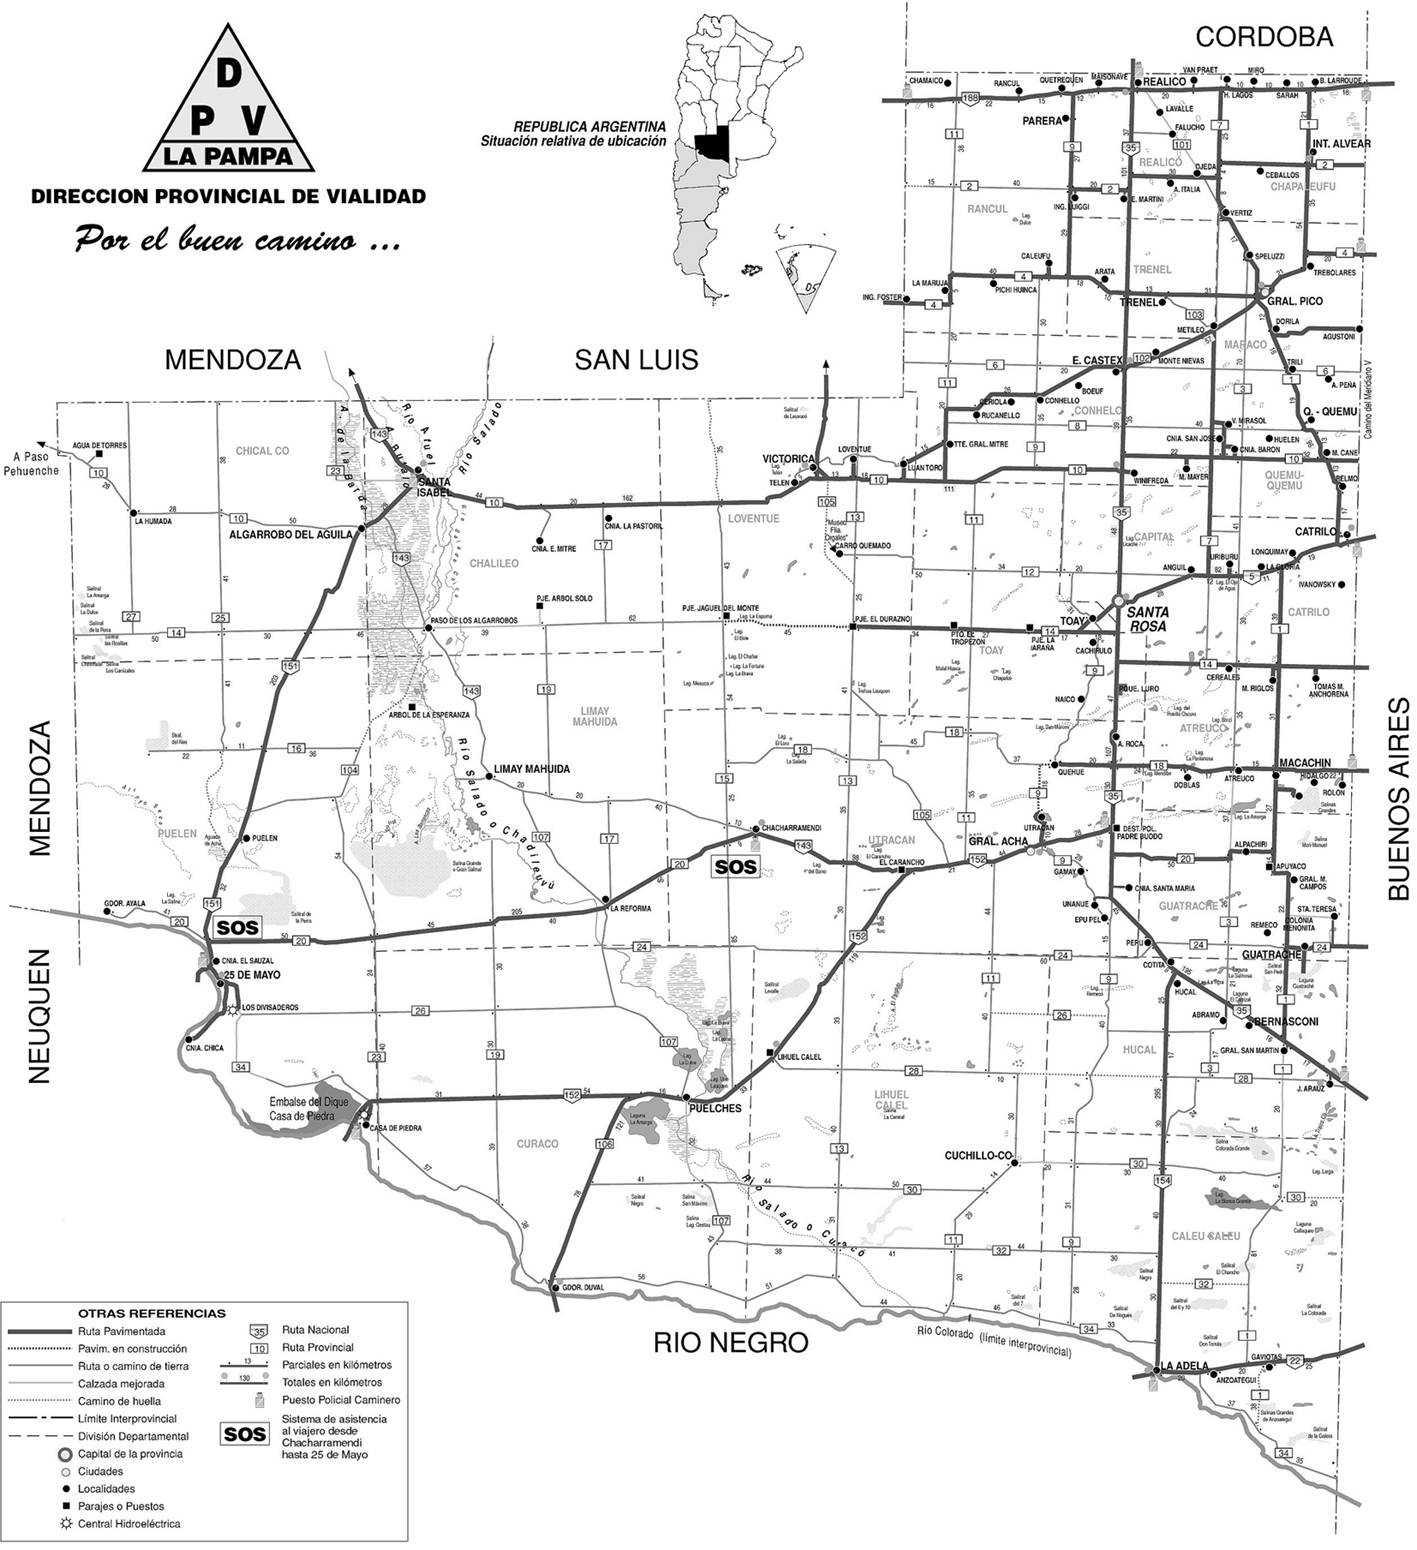 Mapa de Carreteras de La Pampa, Argentina